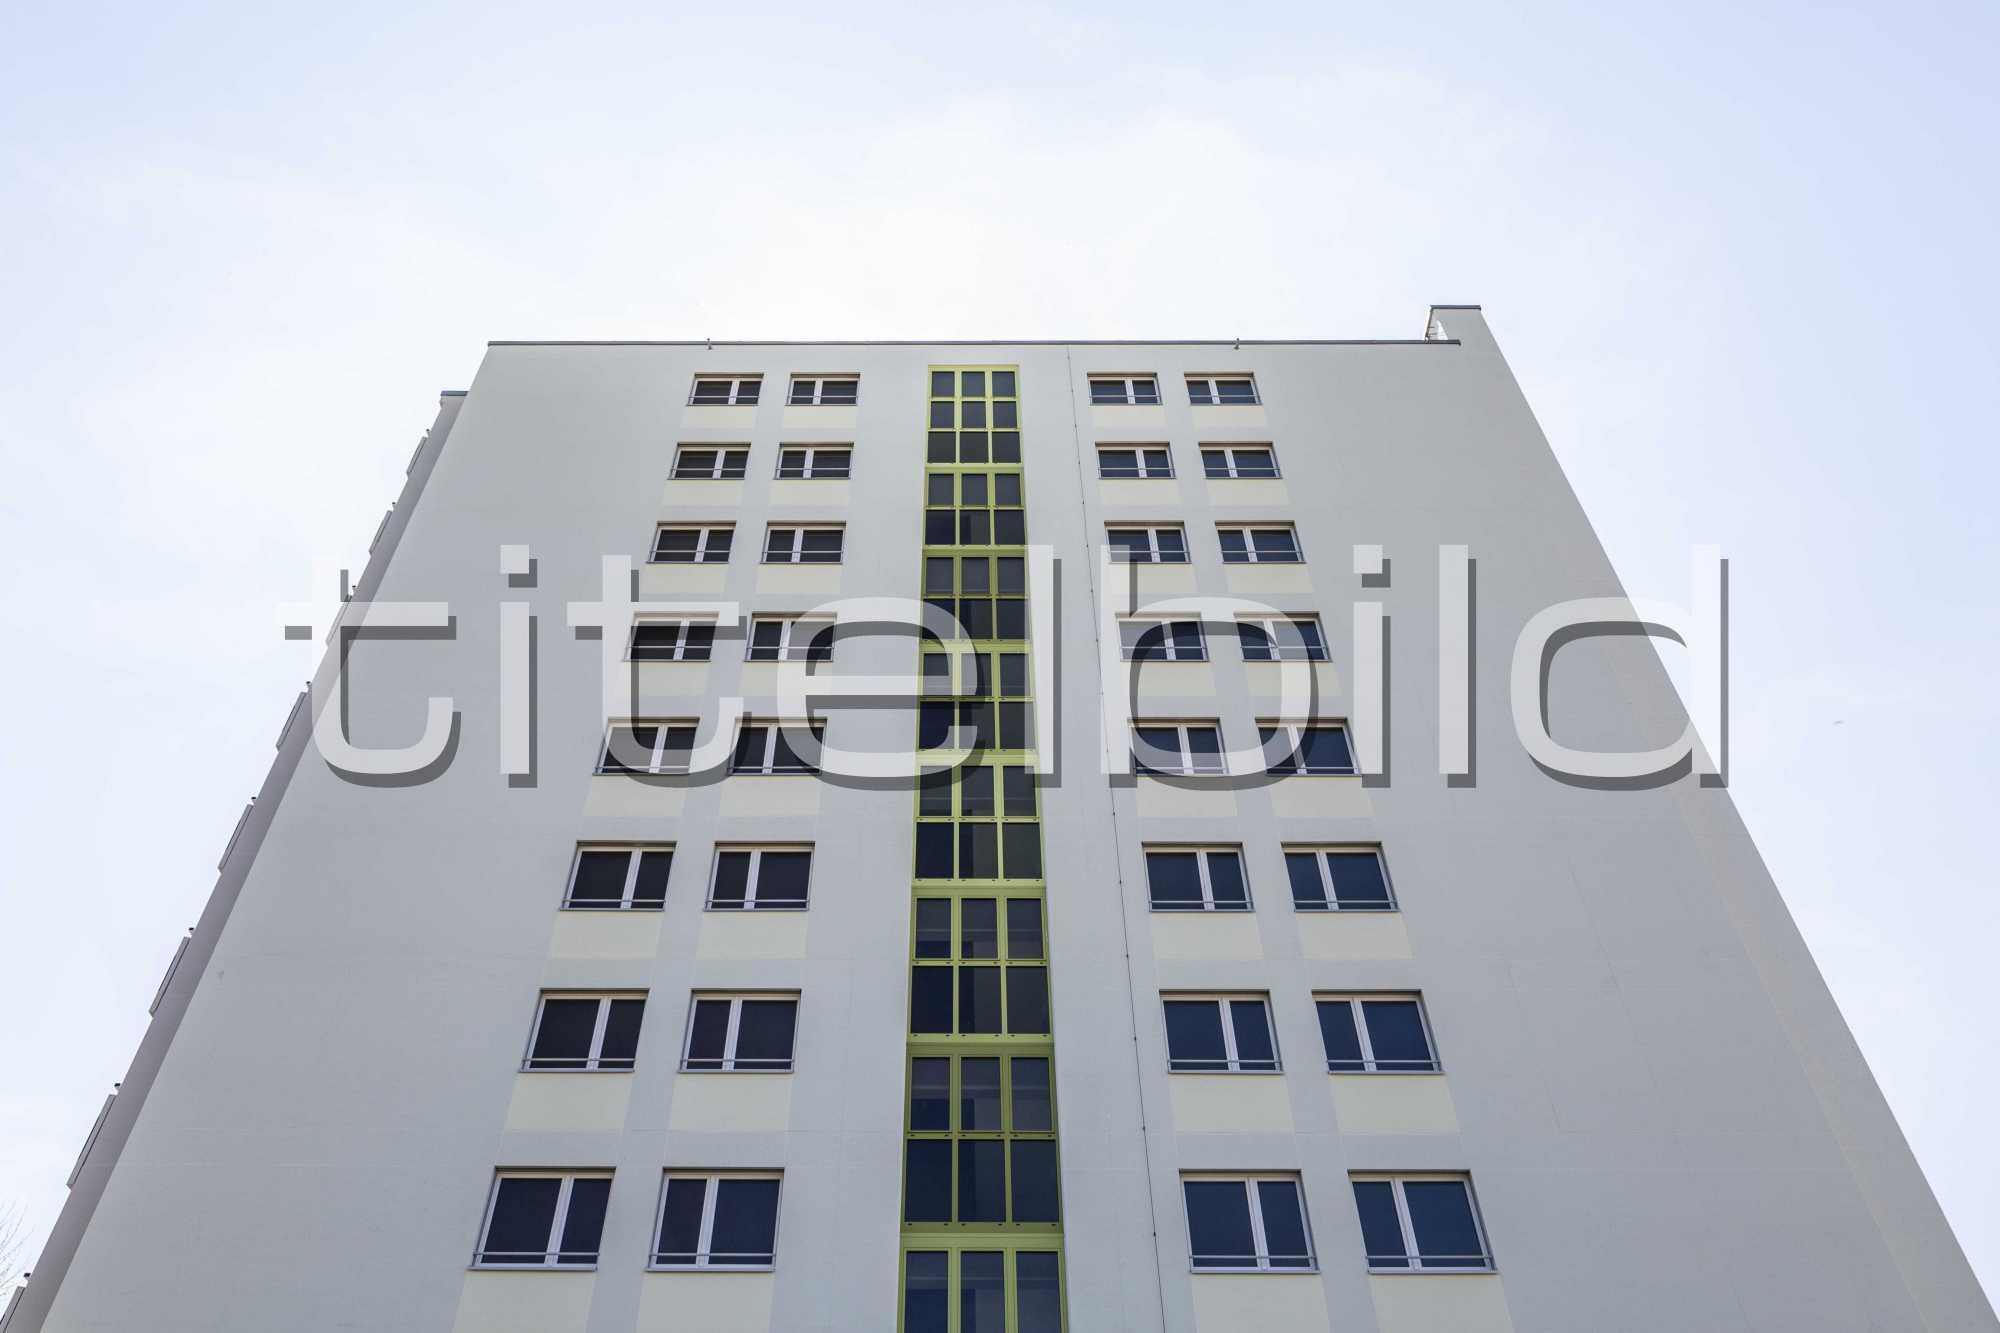 Projektbild-Nr. 5: Waldhofstrasse 54